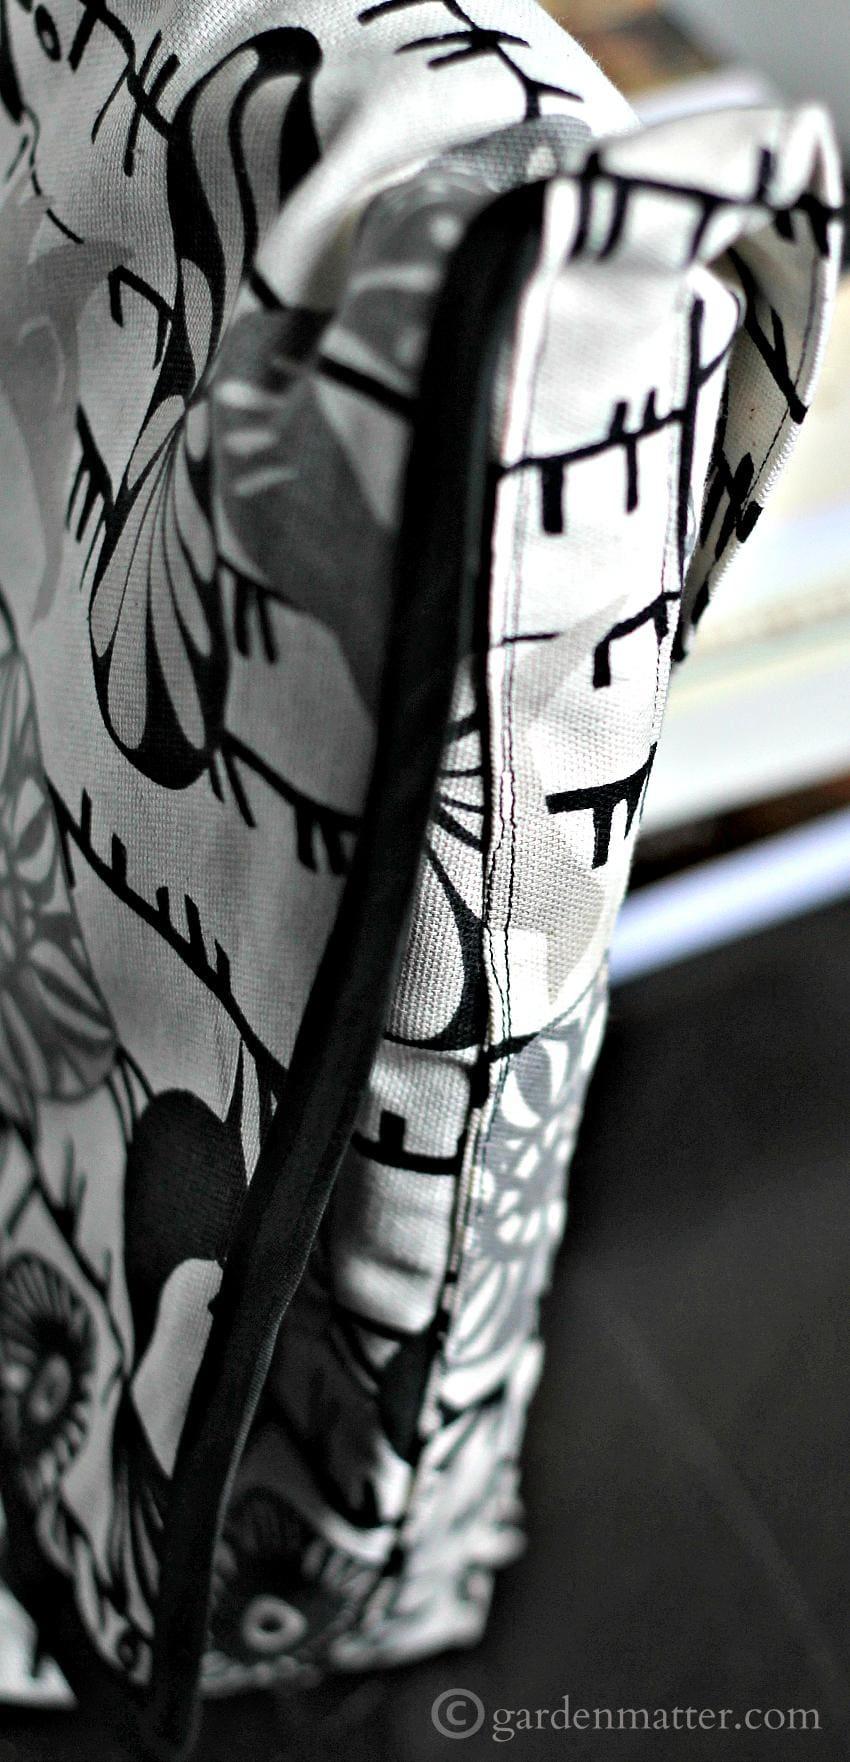 Messenger Bag Side ~gardenmatter.com